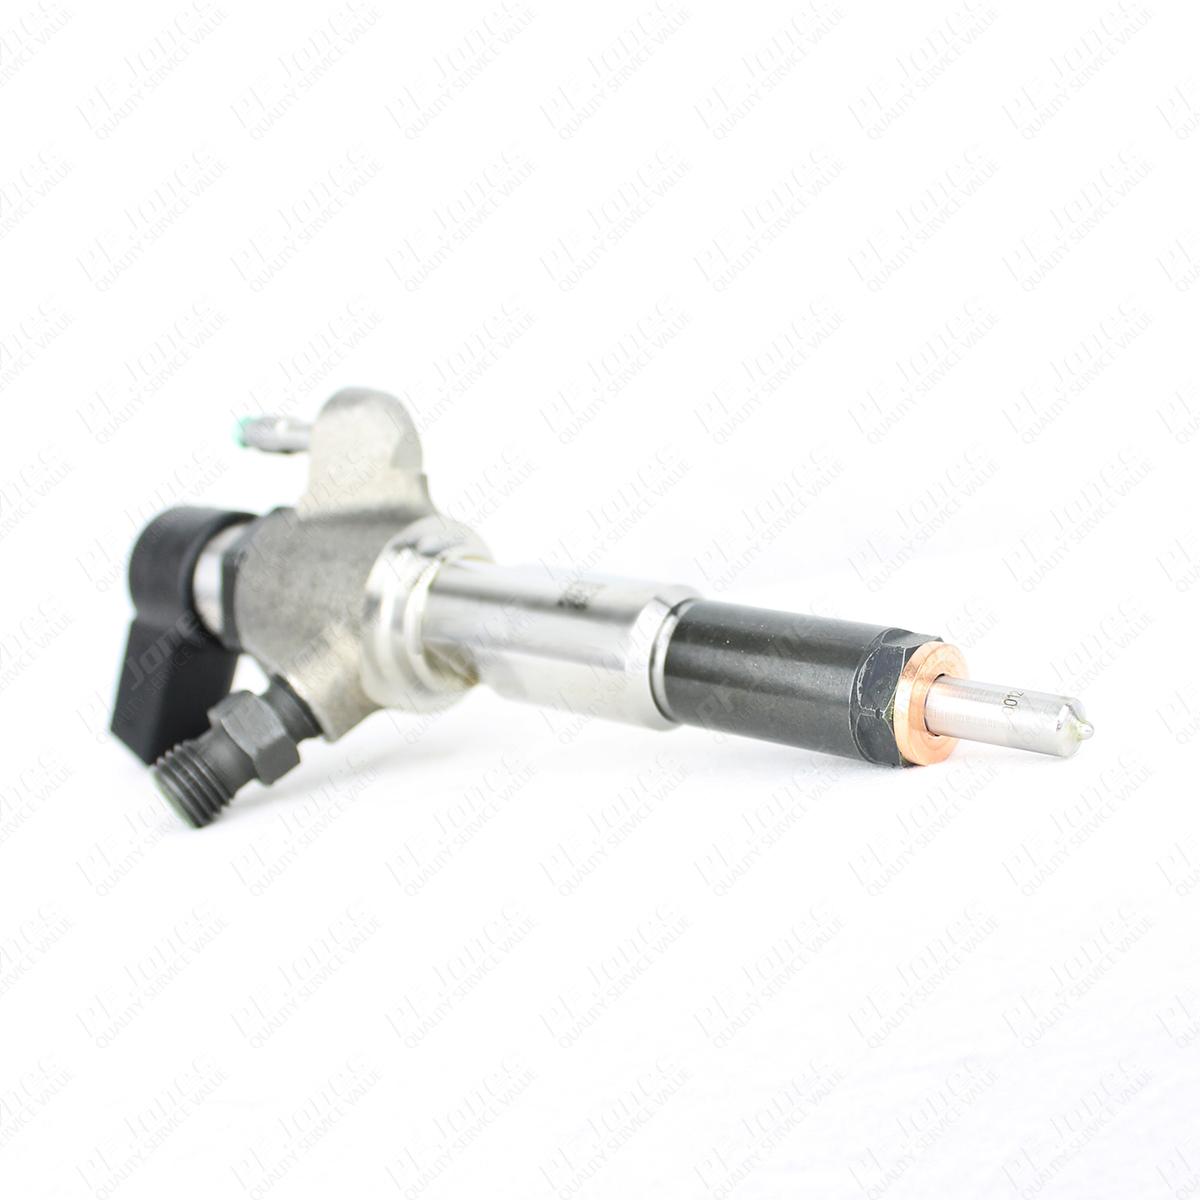 Ford Mondeo 1.6 TDCI 2007 Onwards New Siemens/VDO Diesel Injector A2C59513556